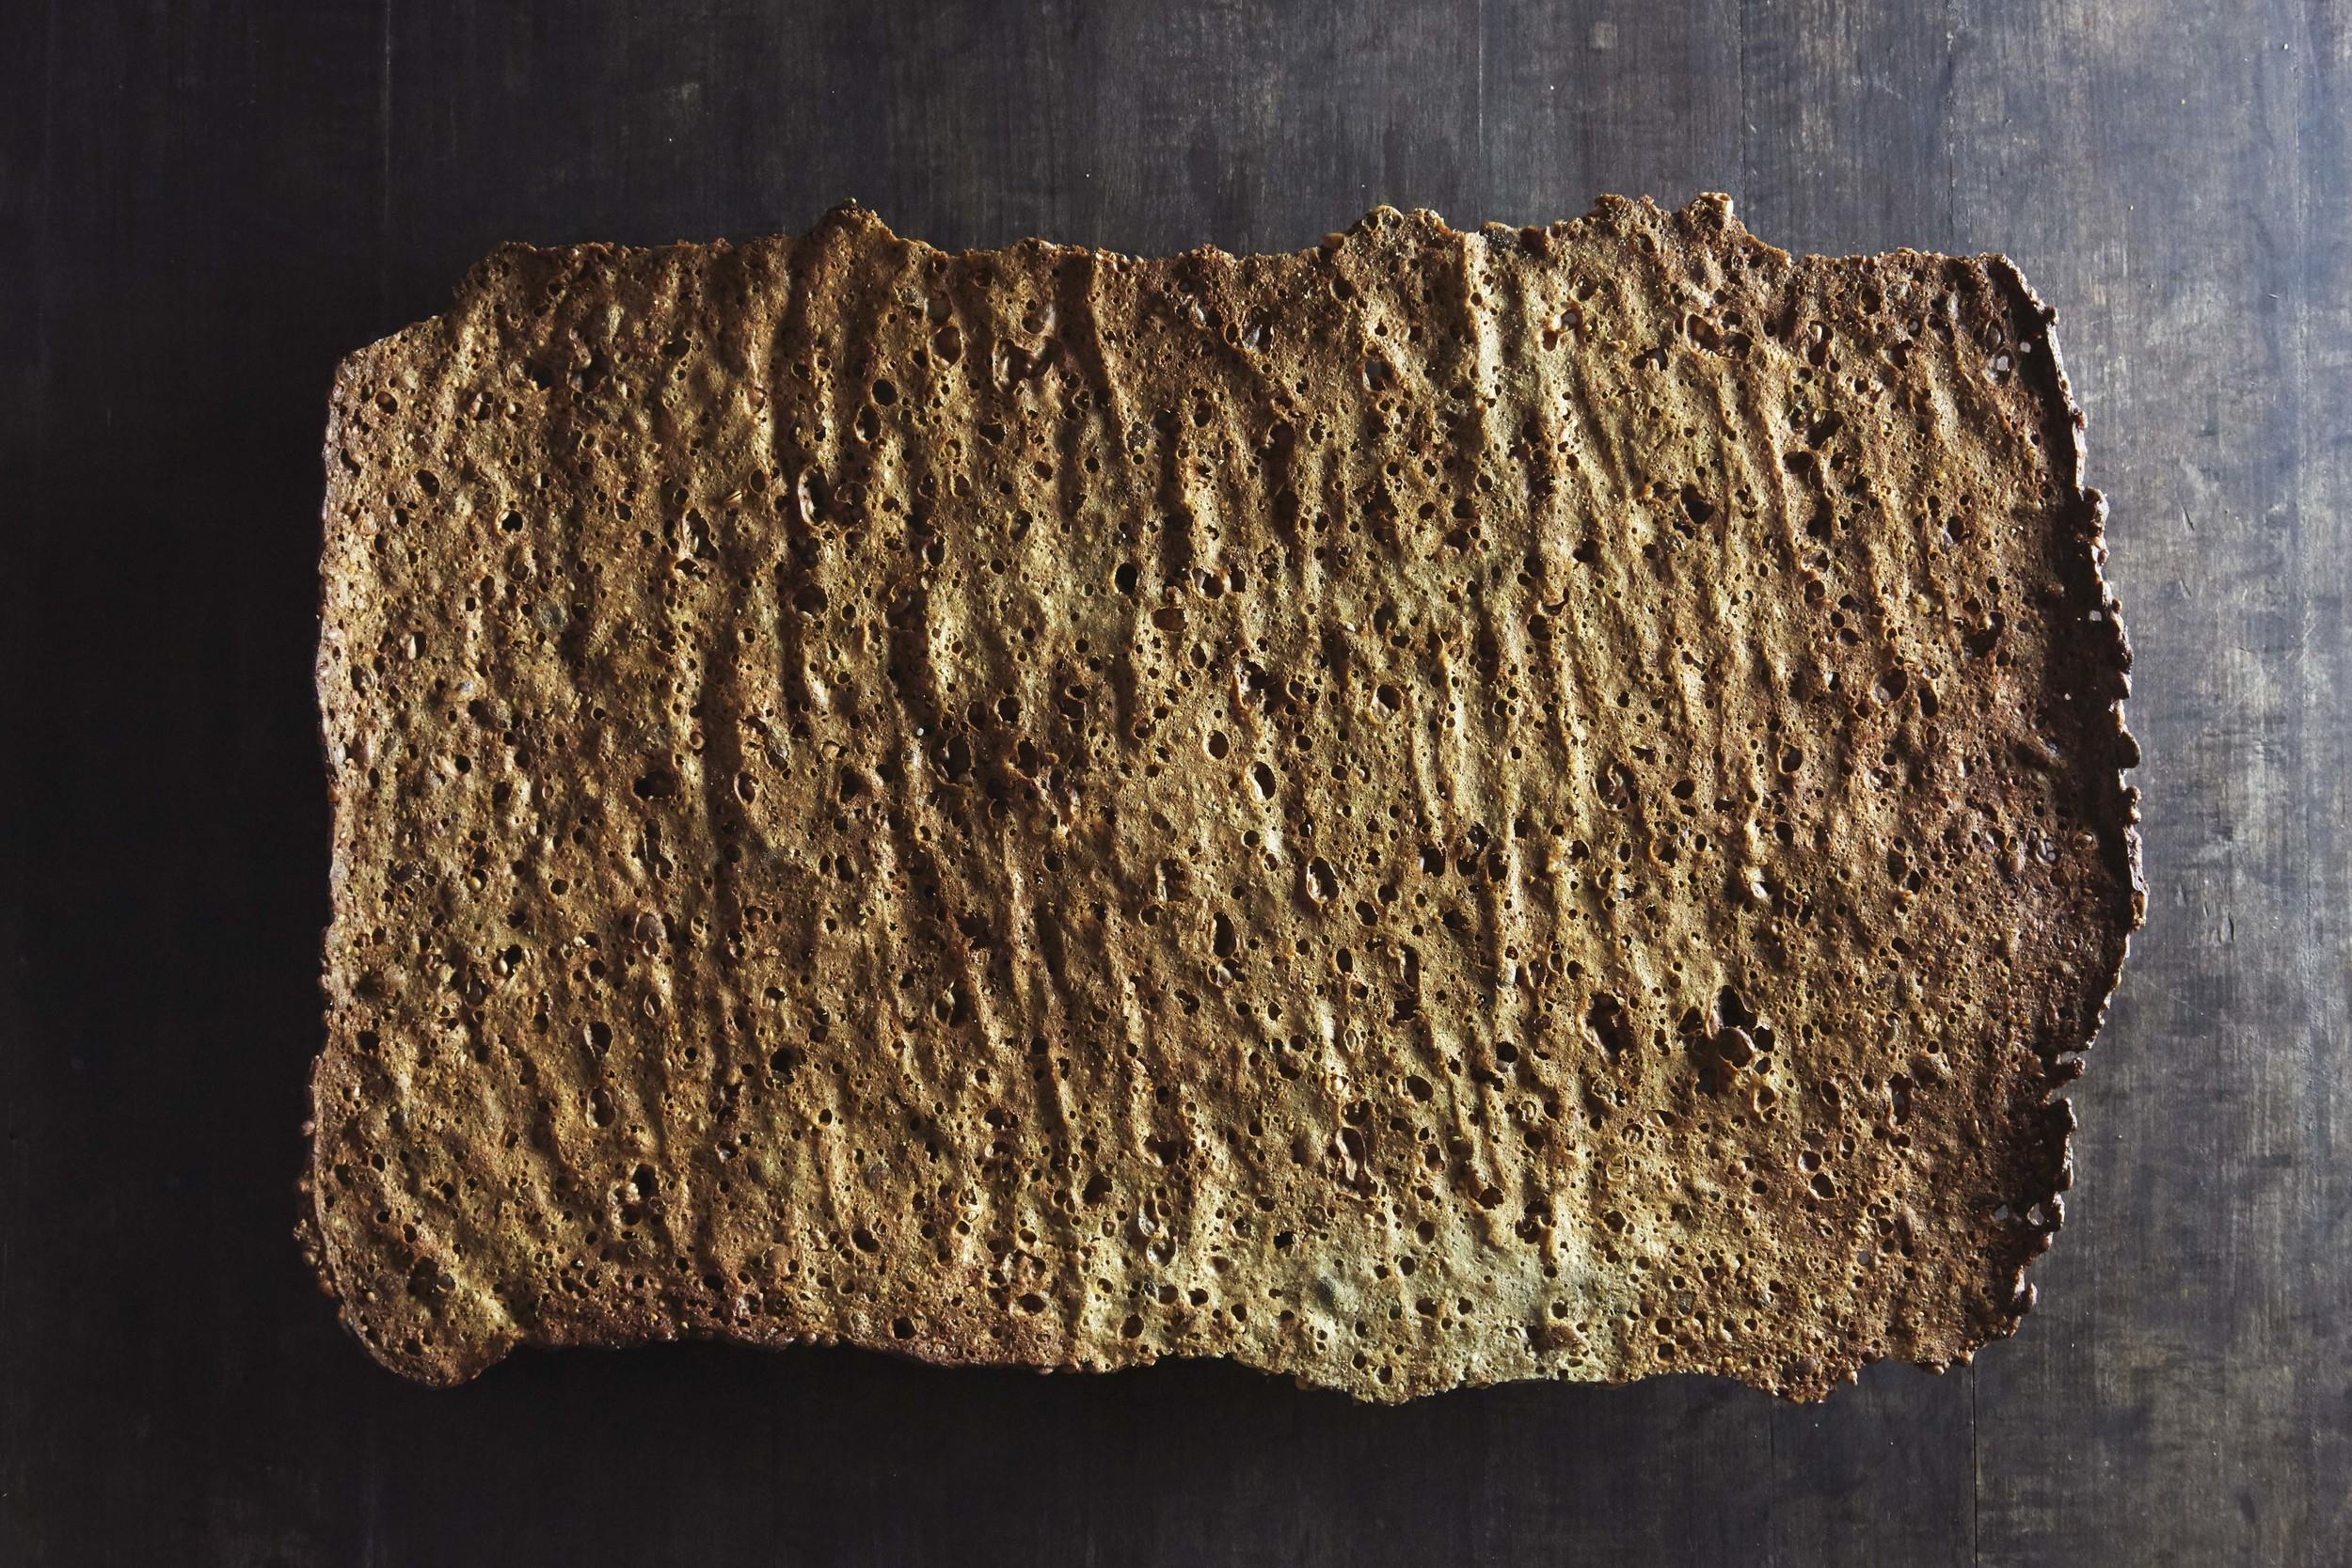 Hard bread from Handwerk, editorial for Matmagasinet NORD.